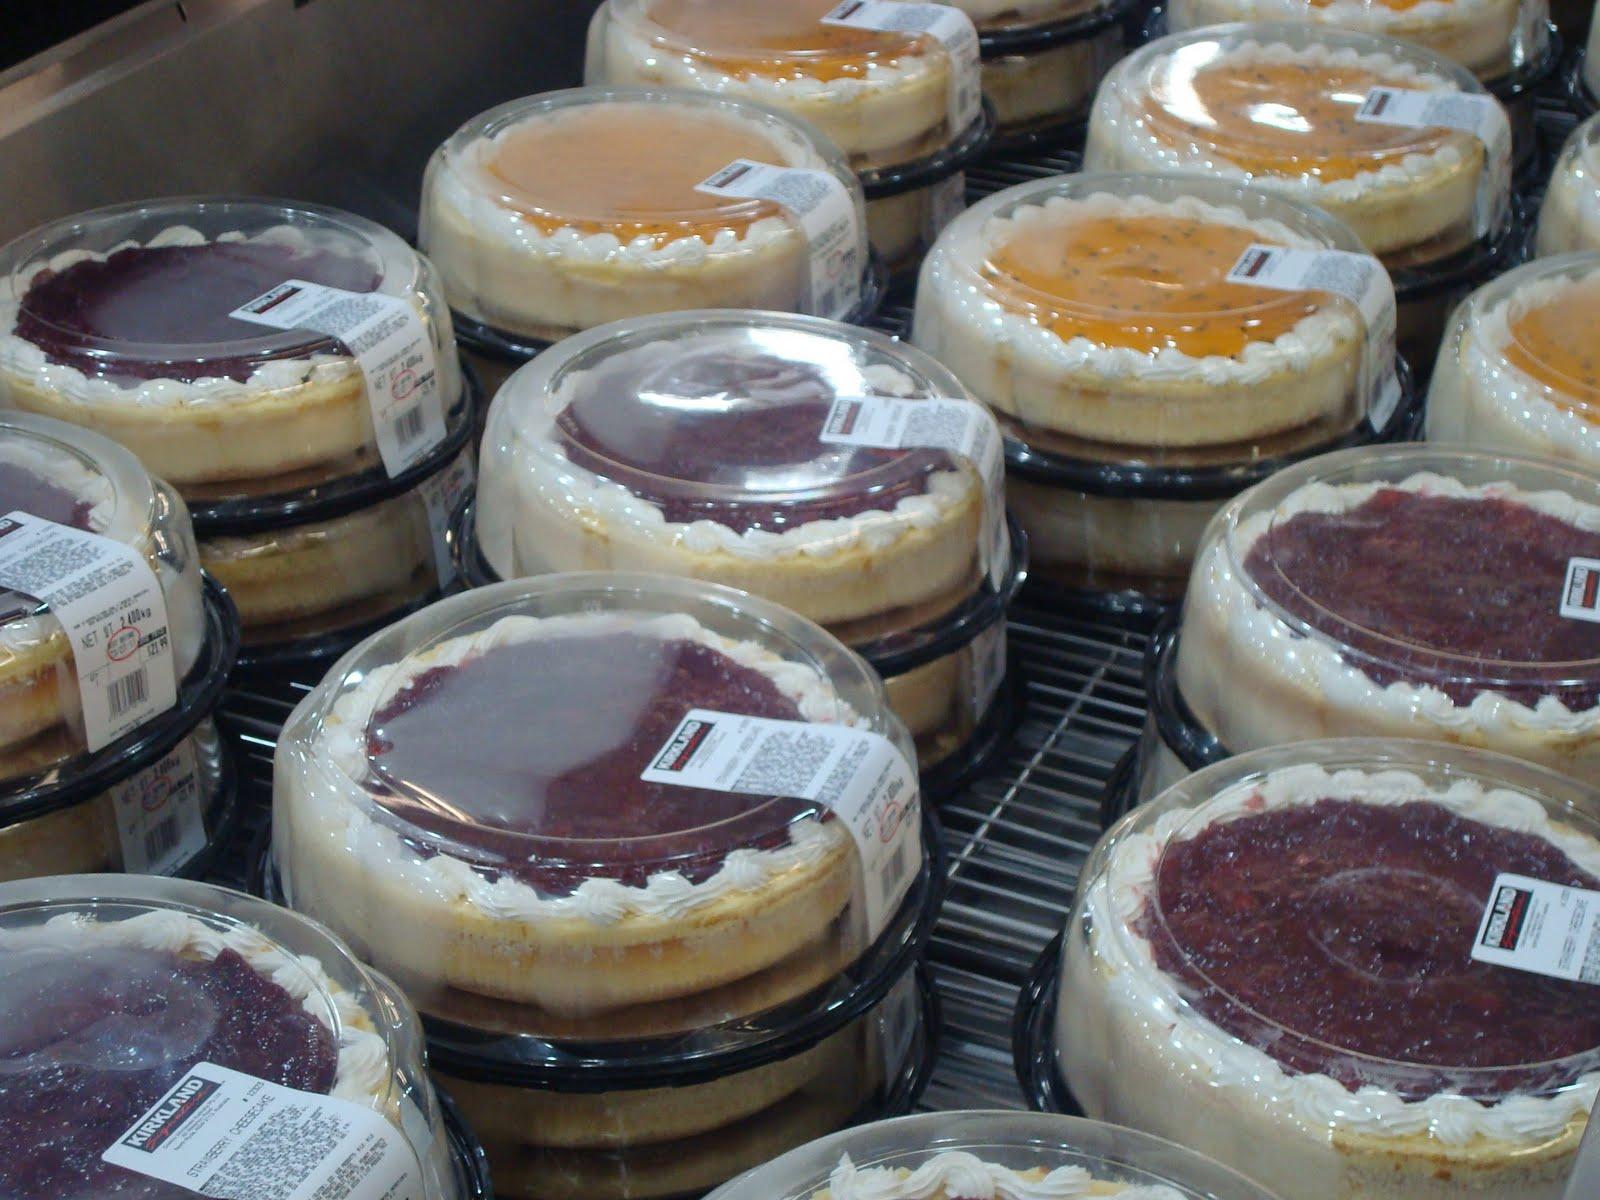 Costco Cream Cakes